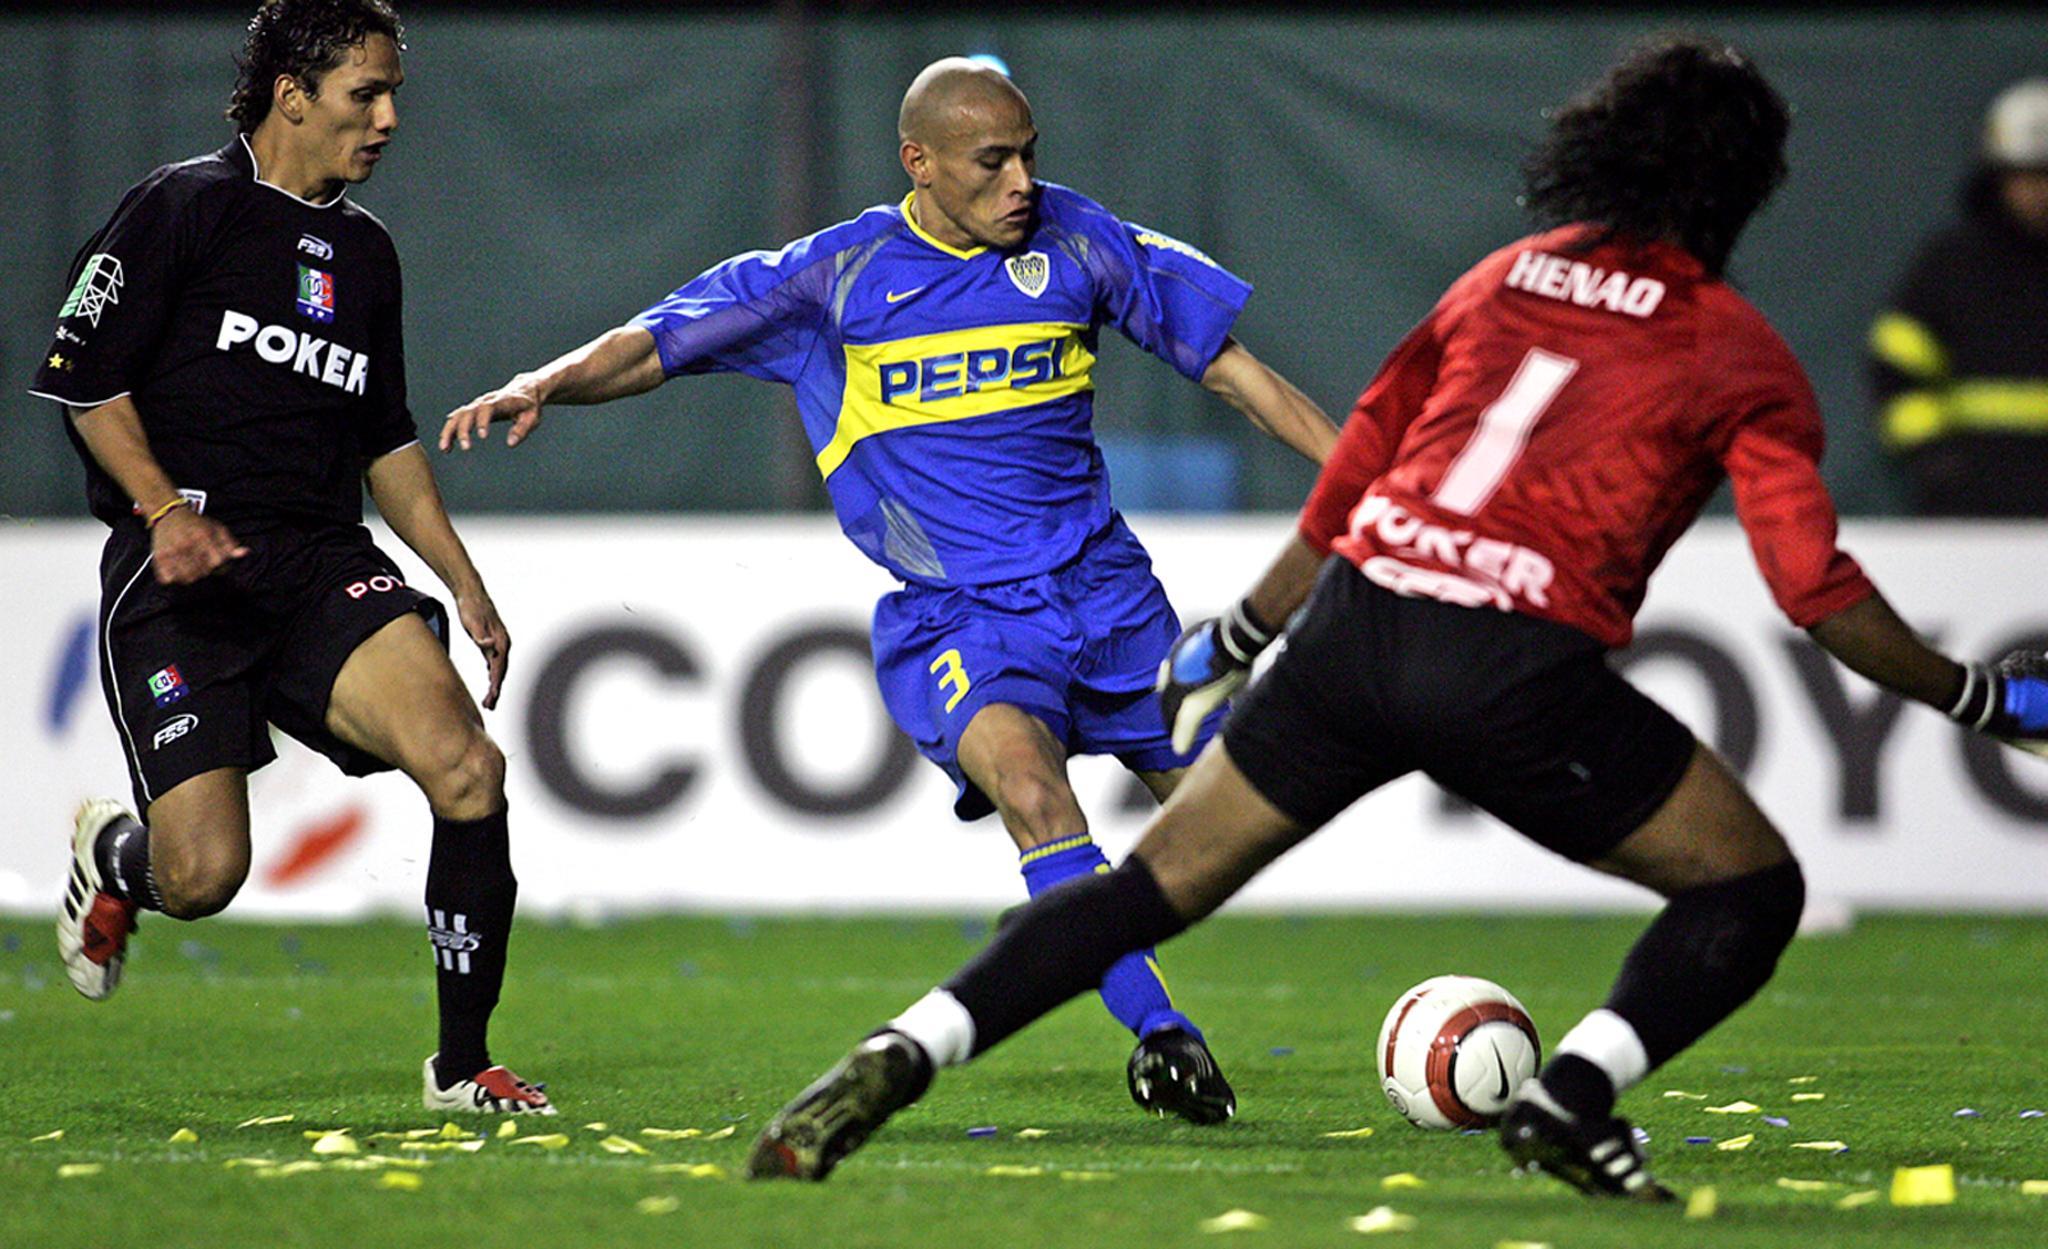 Boca 2004